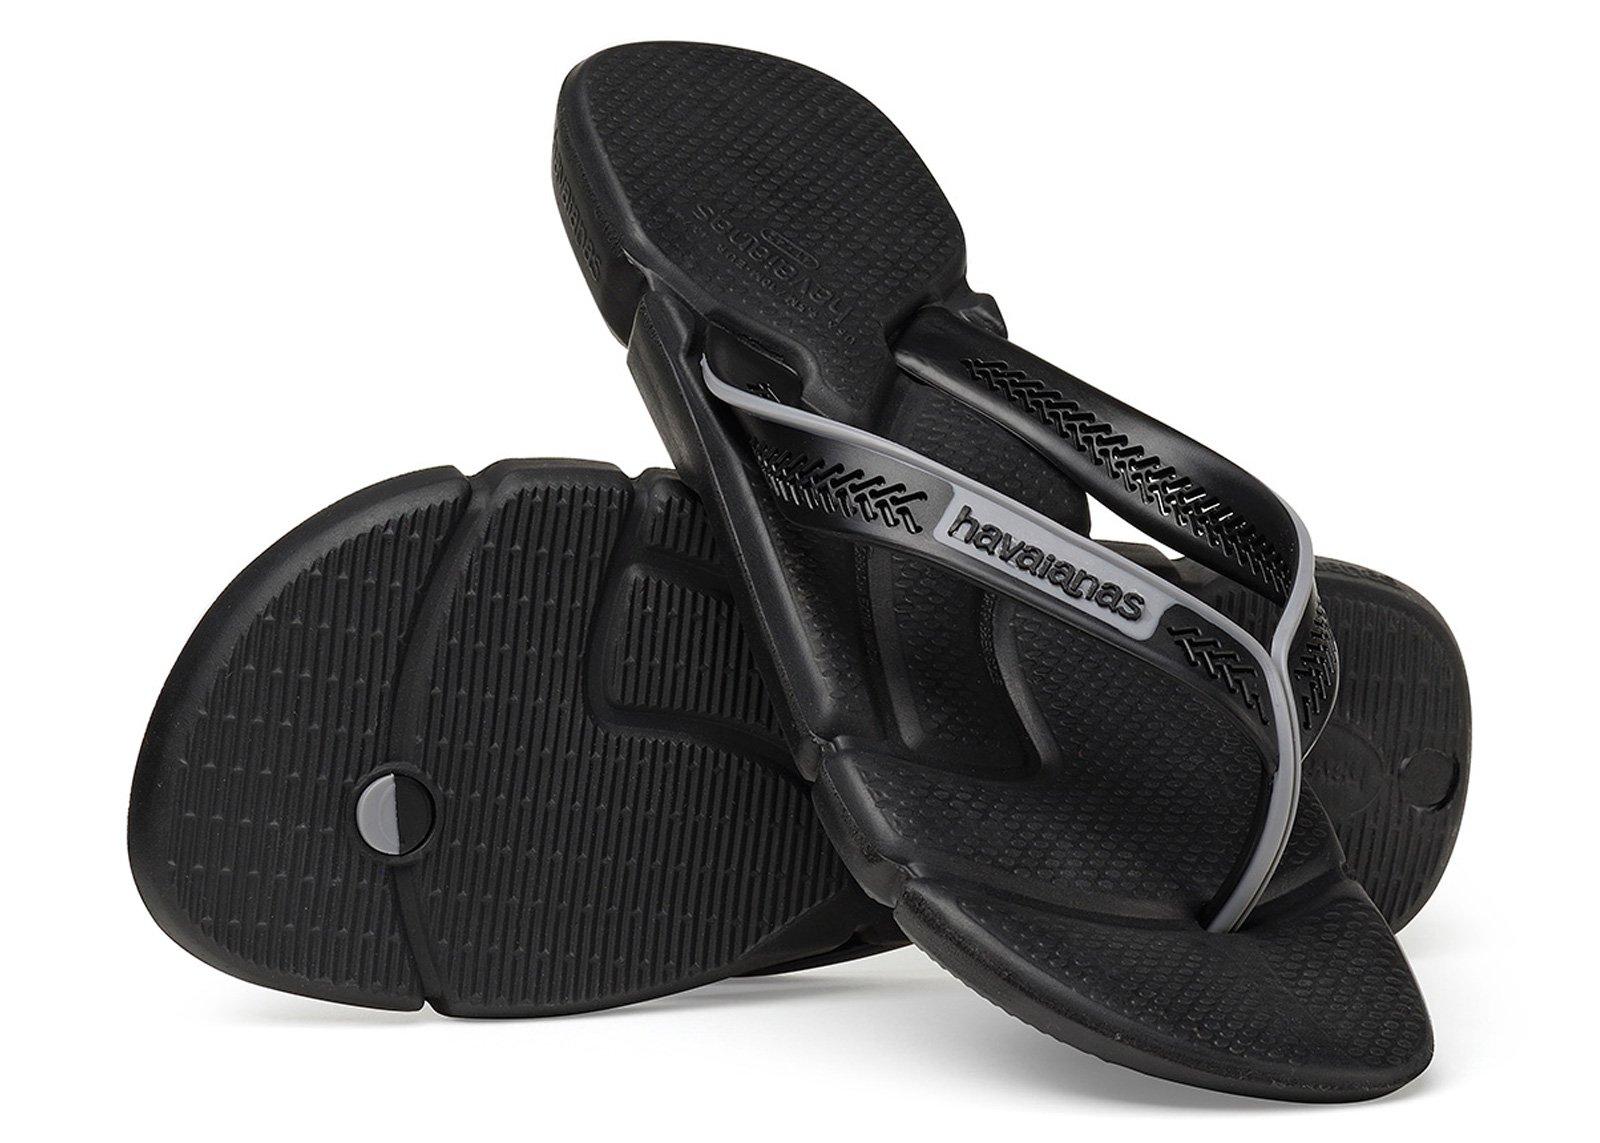 8b11d7f31 Flip-Flops Power Black-steel Grey - Brand Havaianas